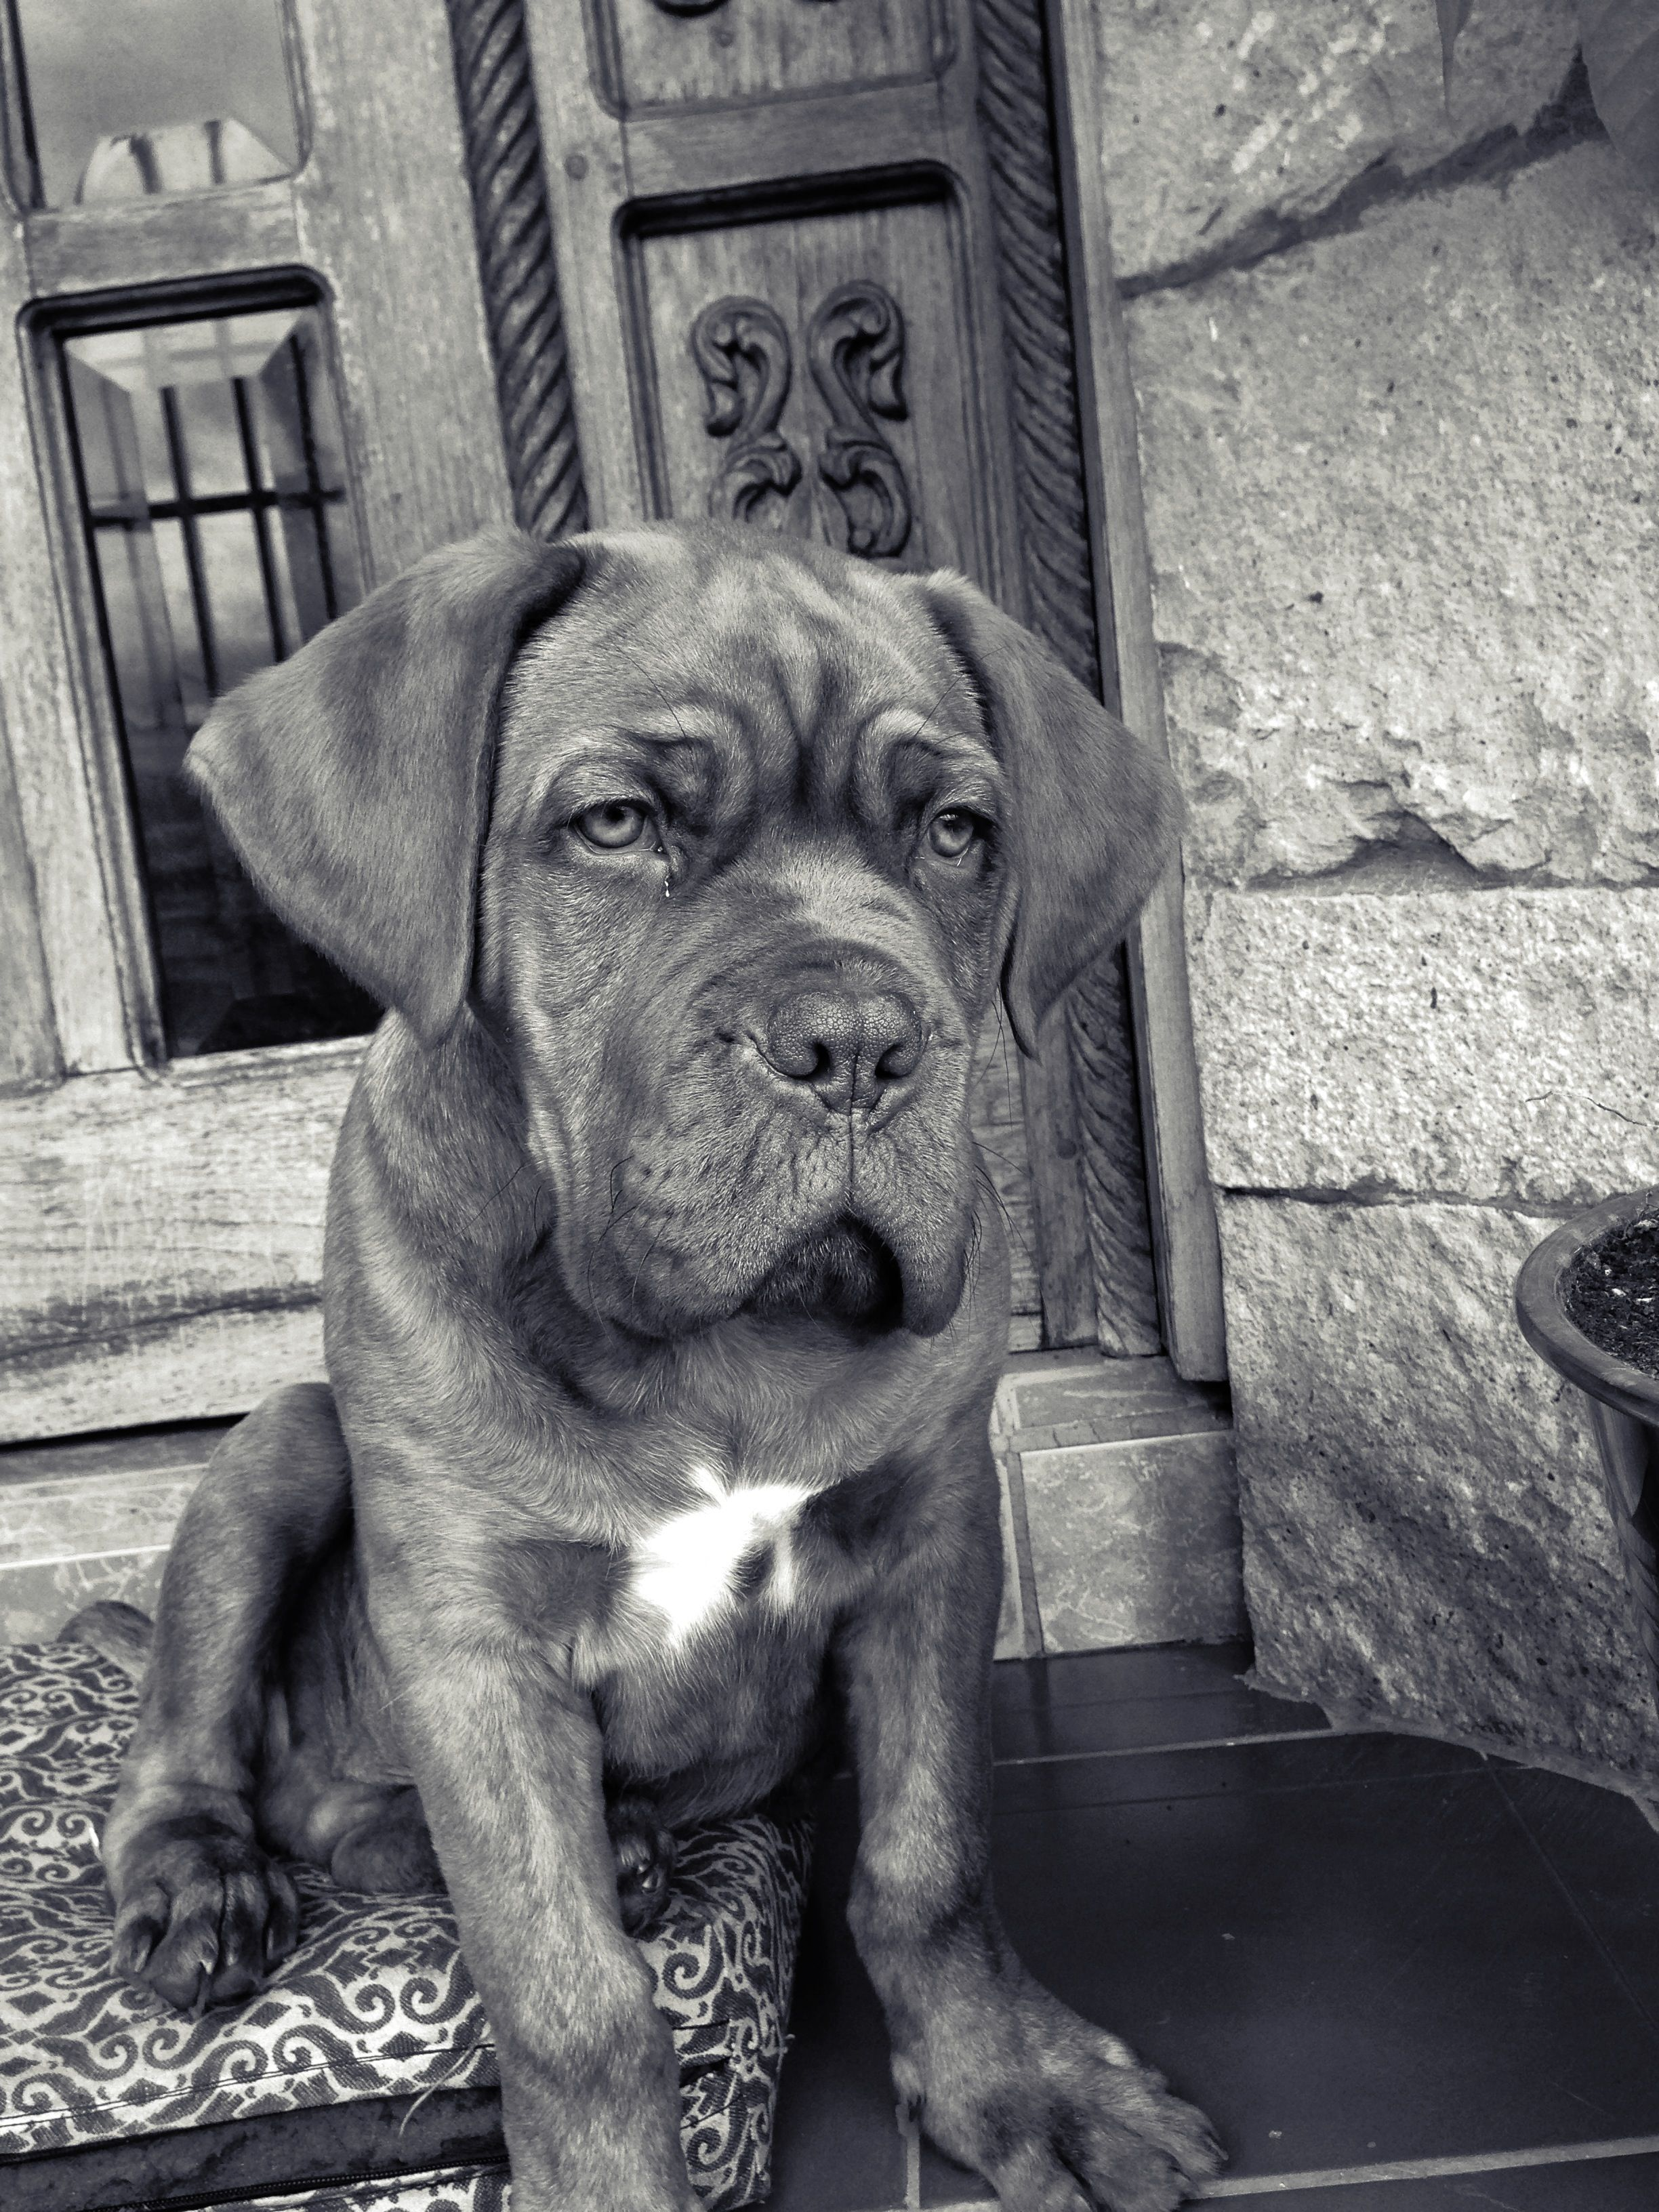 Dogo De Burdeos Dogo De Burdeos Burdeos Mascotas